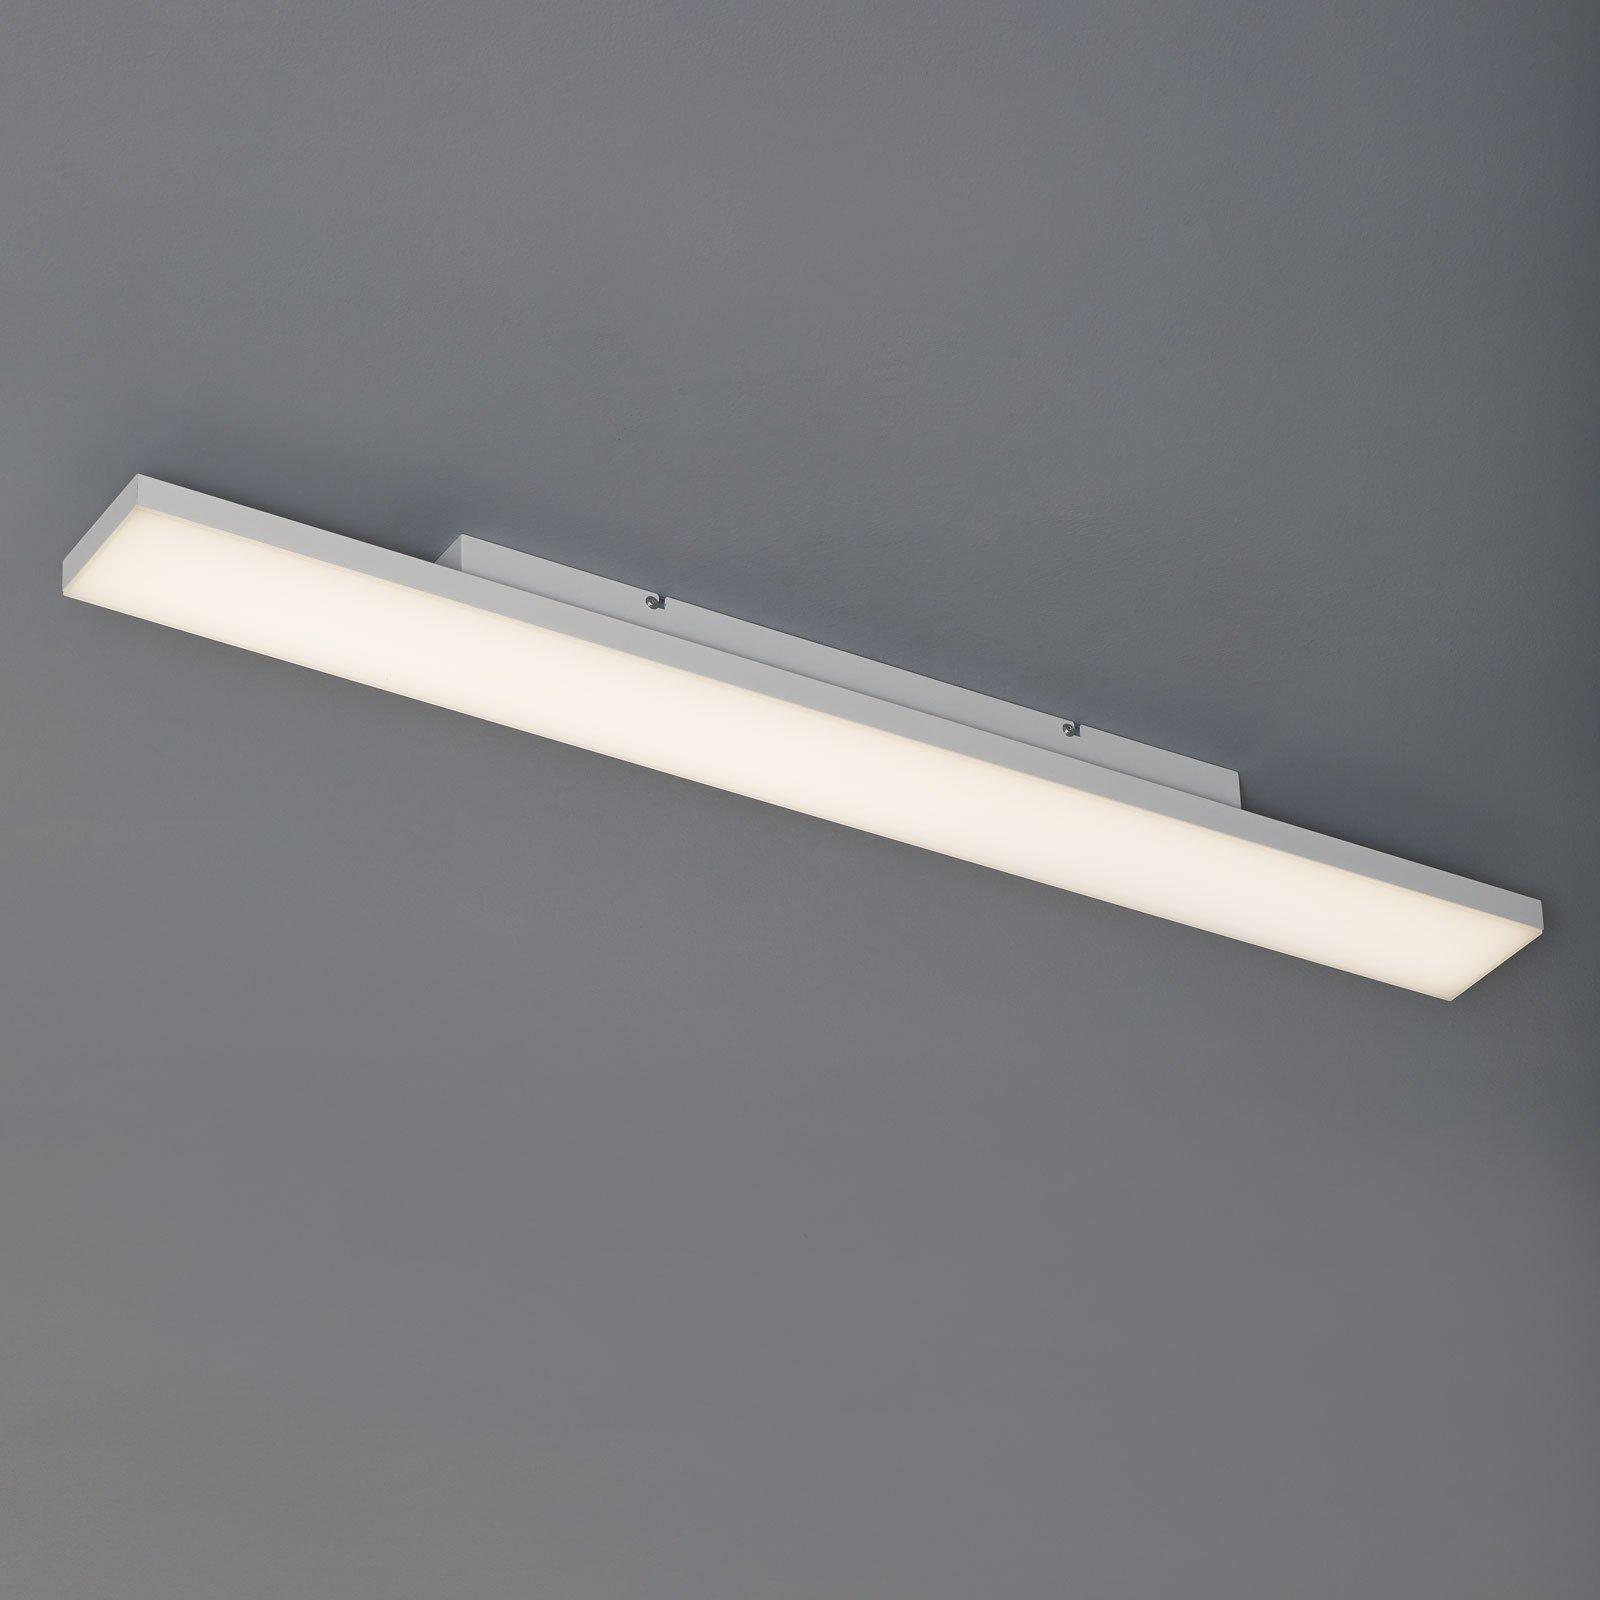 Paul Neuhaus Frameless taklampe CCT 100x10cm